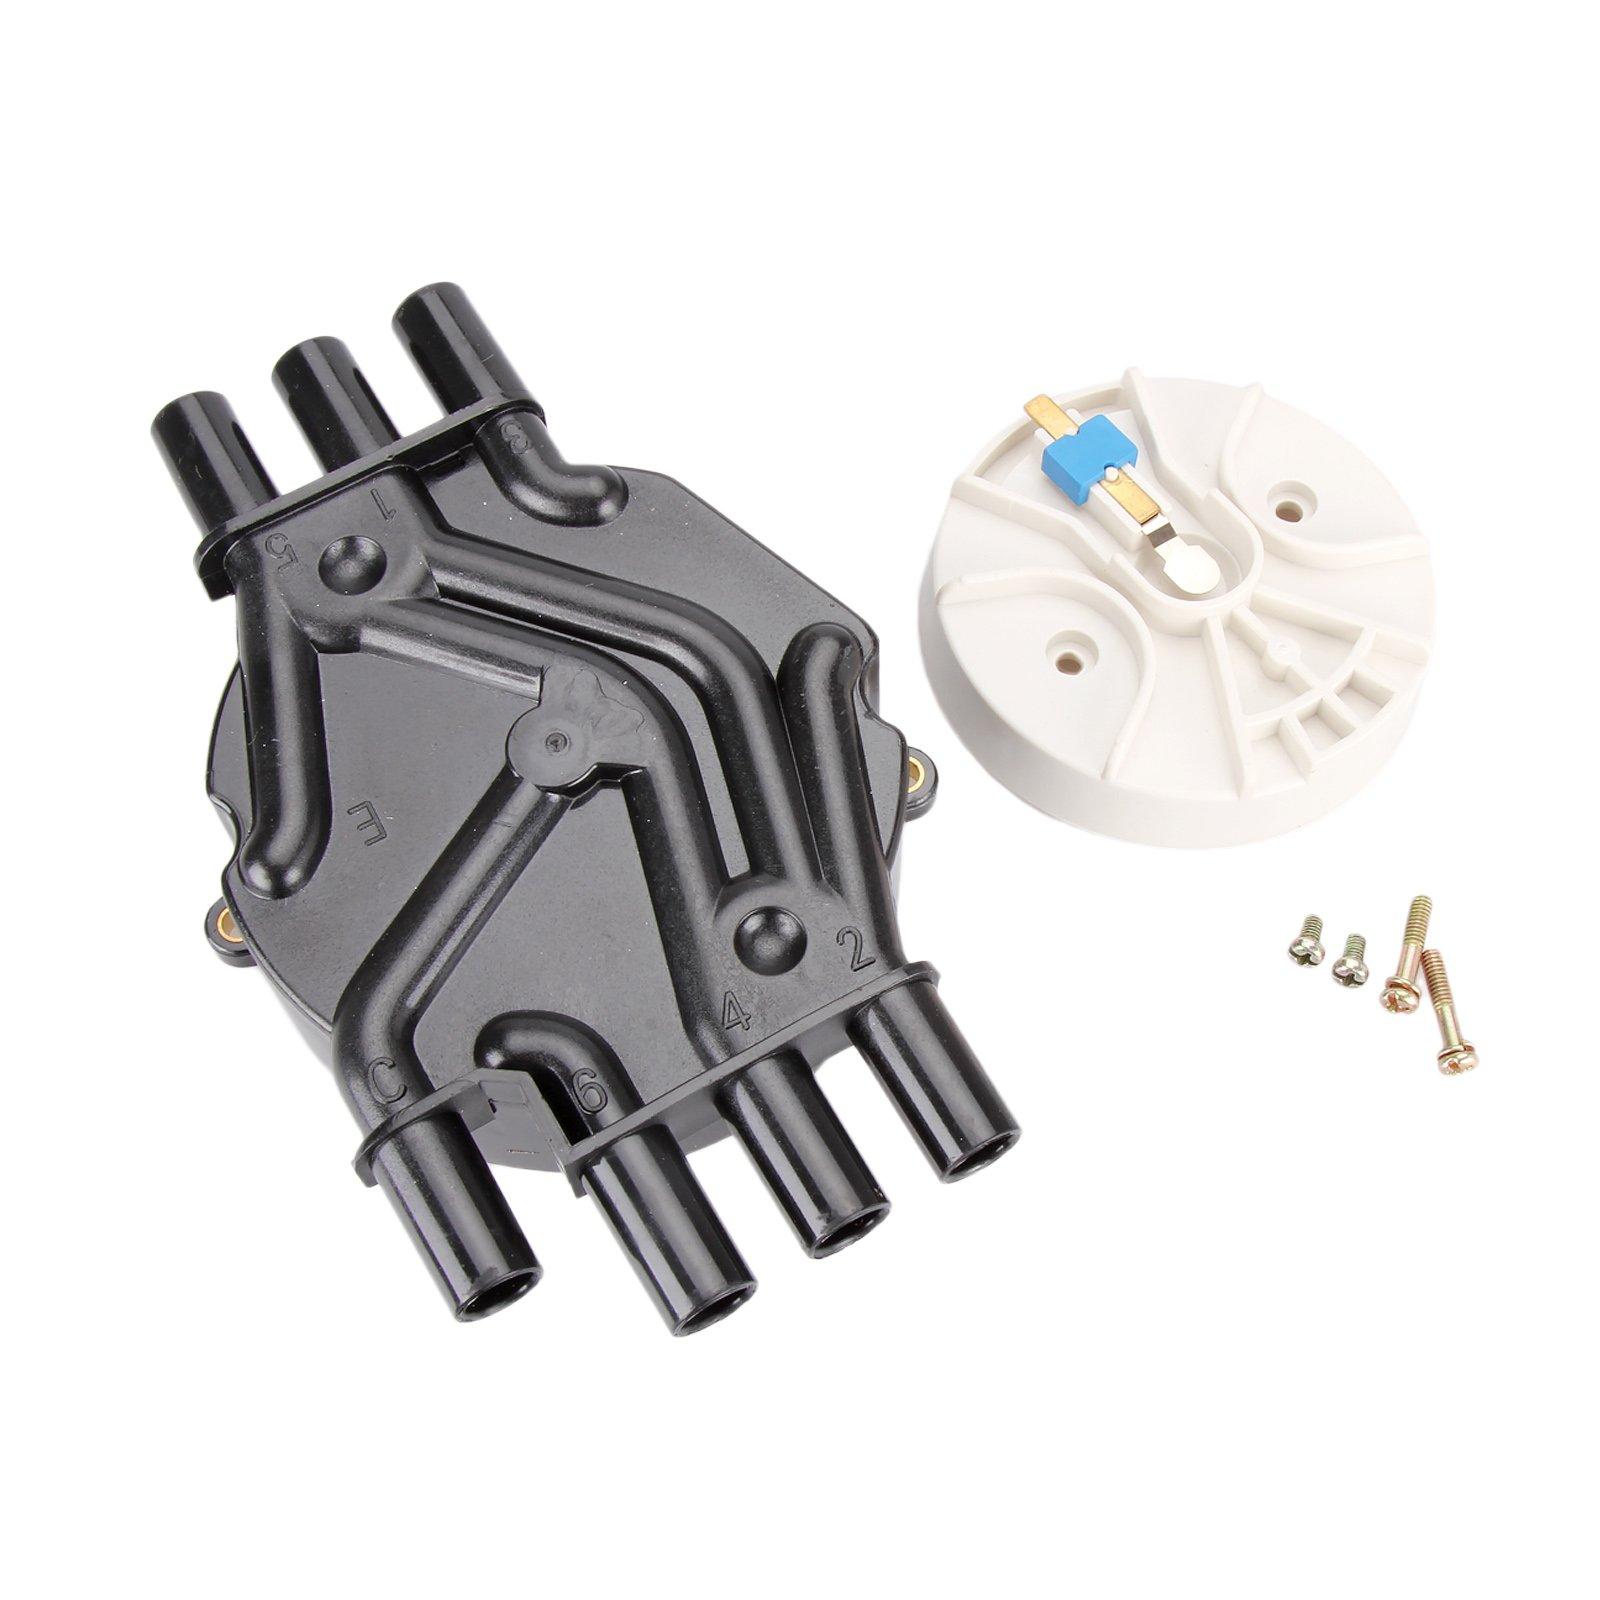 Dromedary OEM For Rotor D465 10452457 and Distributor Cap 10452458 D328A 4.3L Kit Set